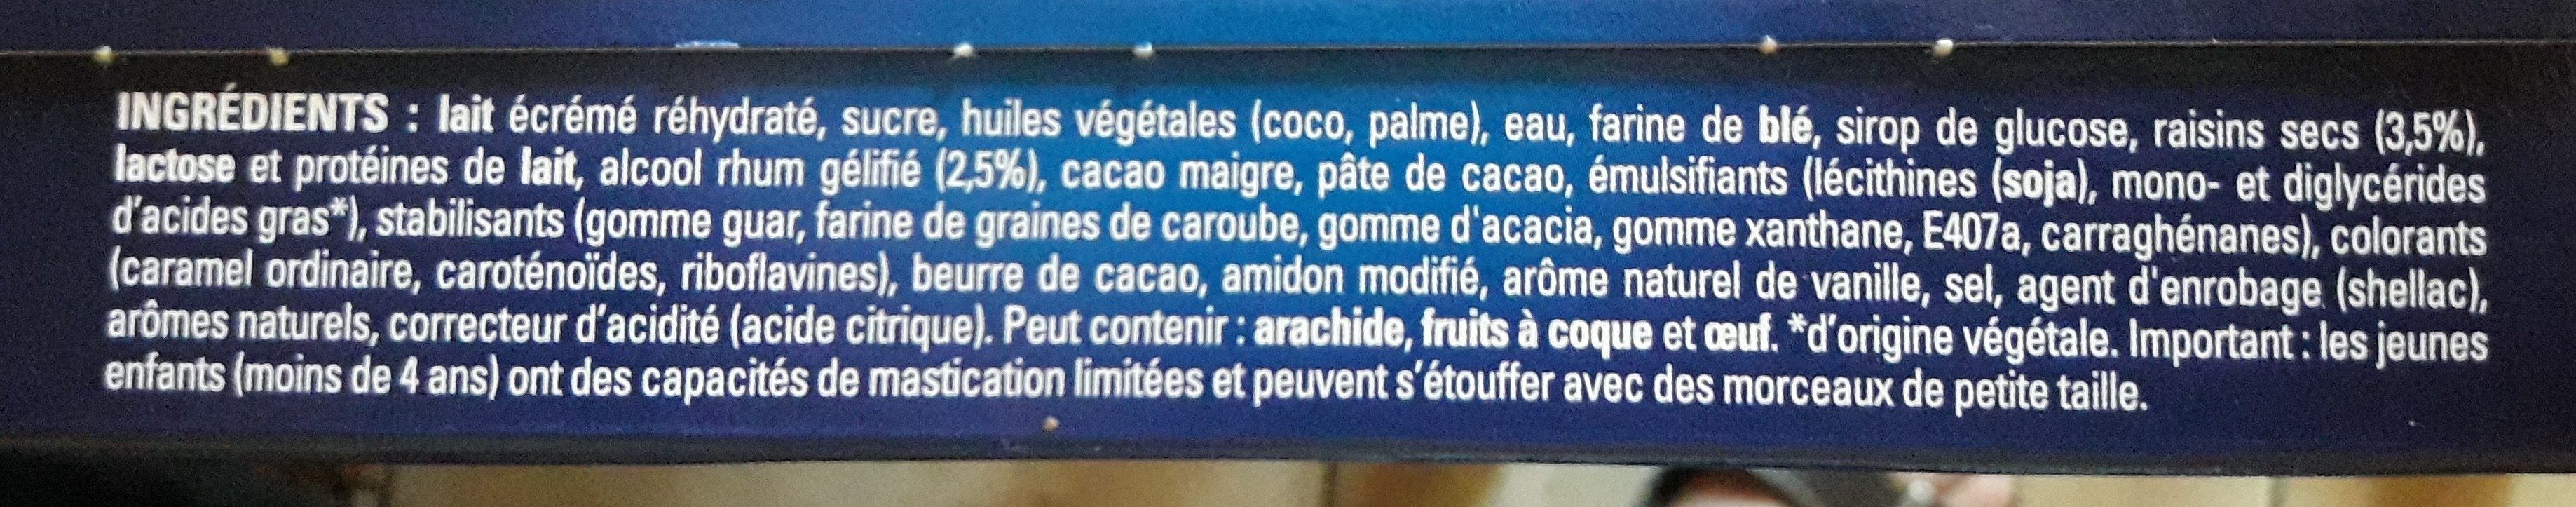 Extrême Rhum Raisin - Ingredients - fr